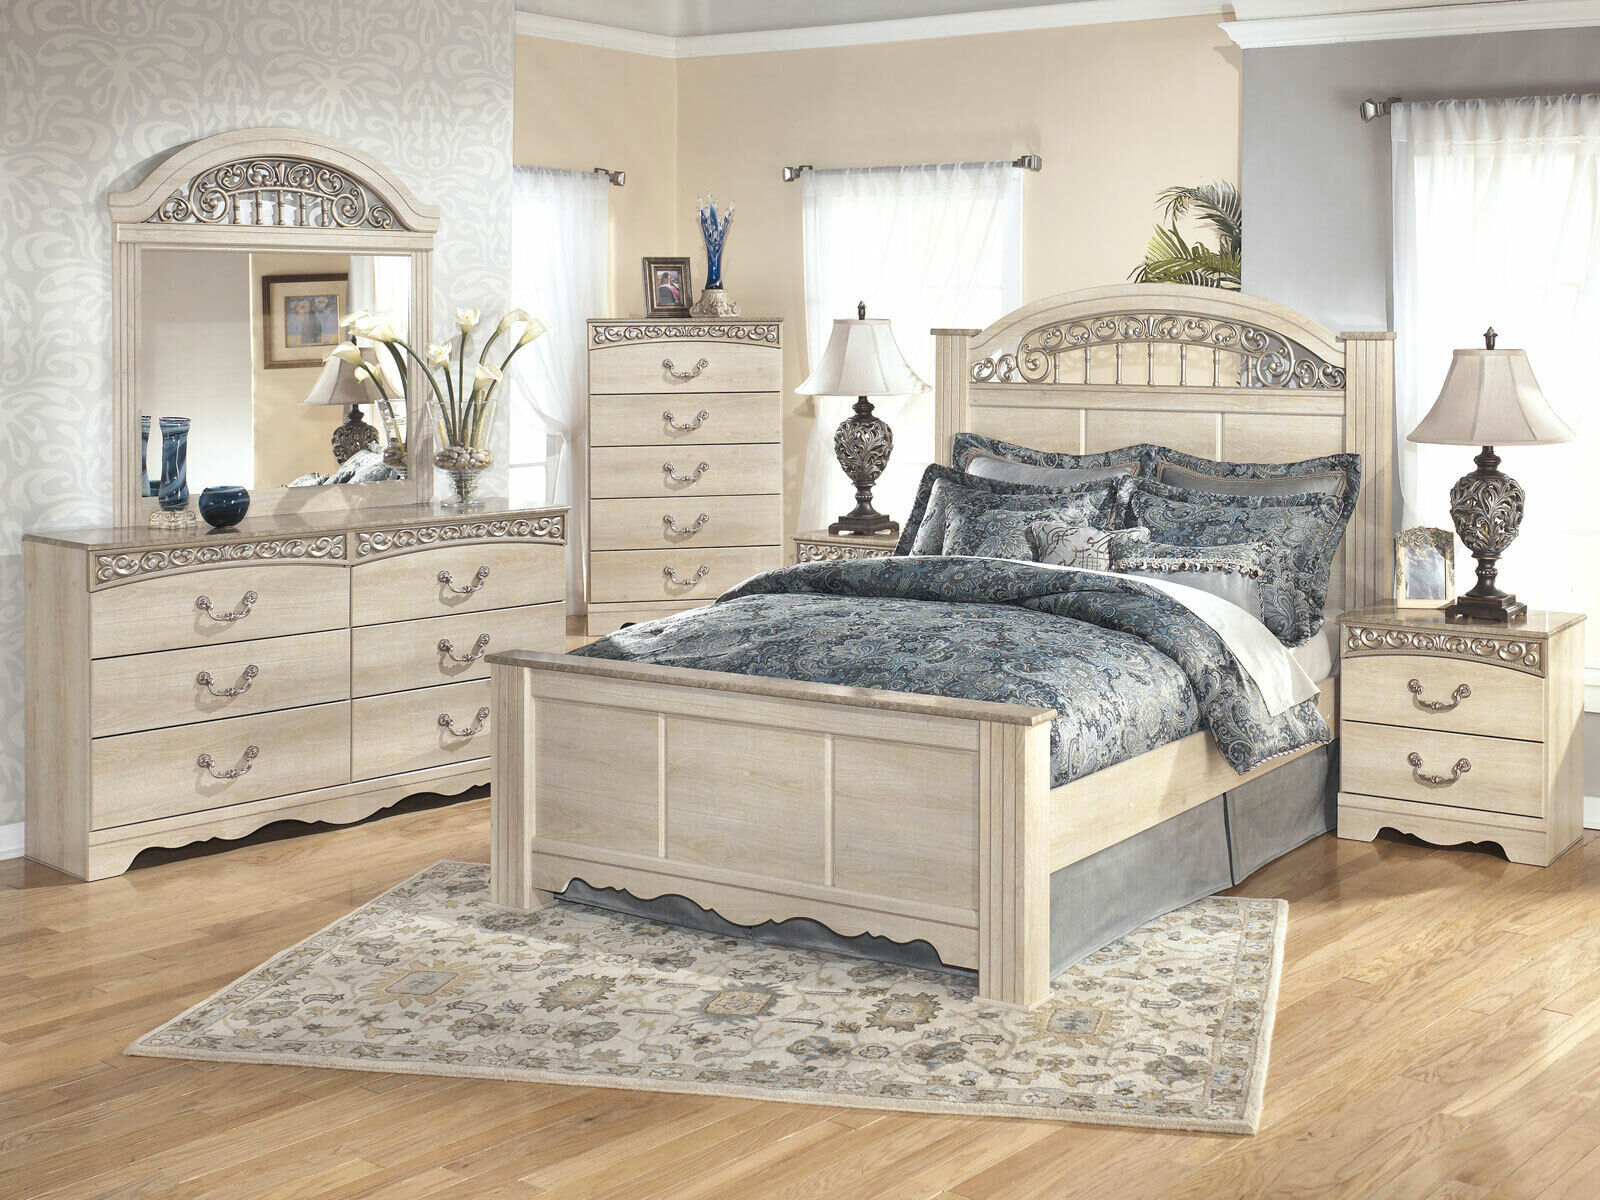 5 Piece Bedroom Set For Sale Online Ebay